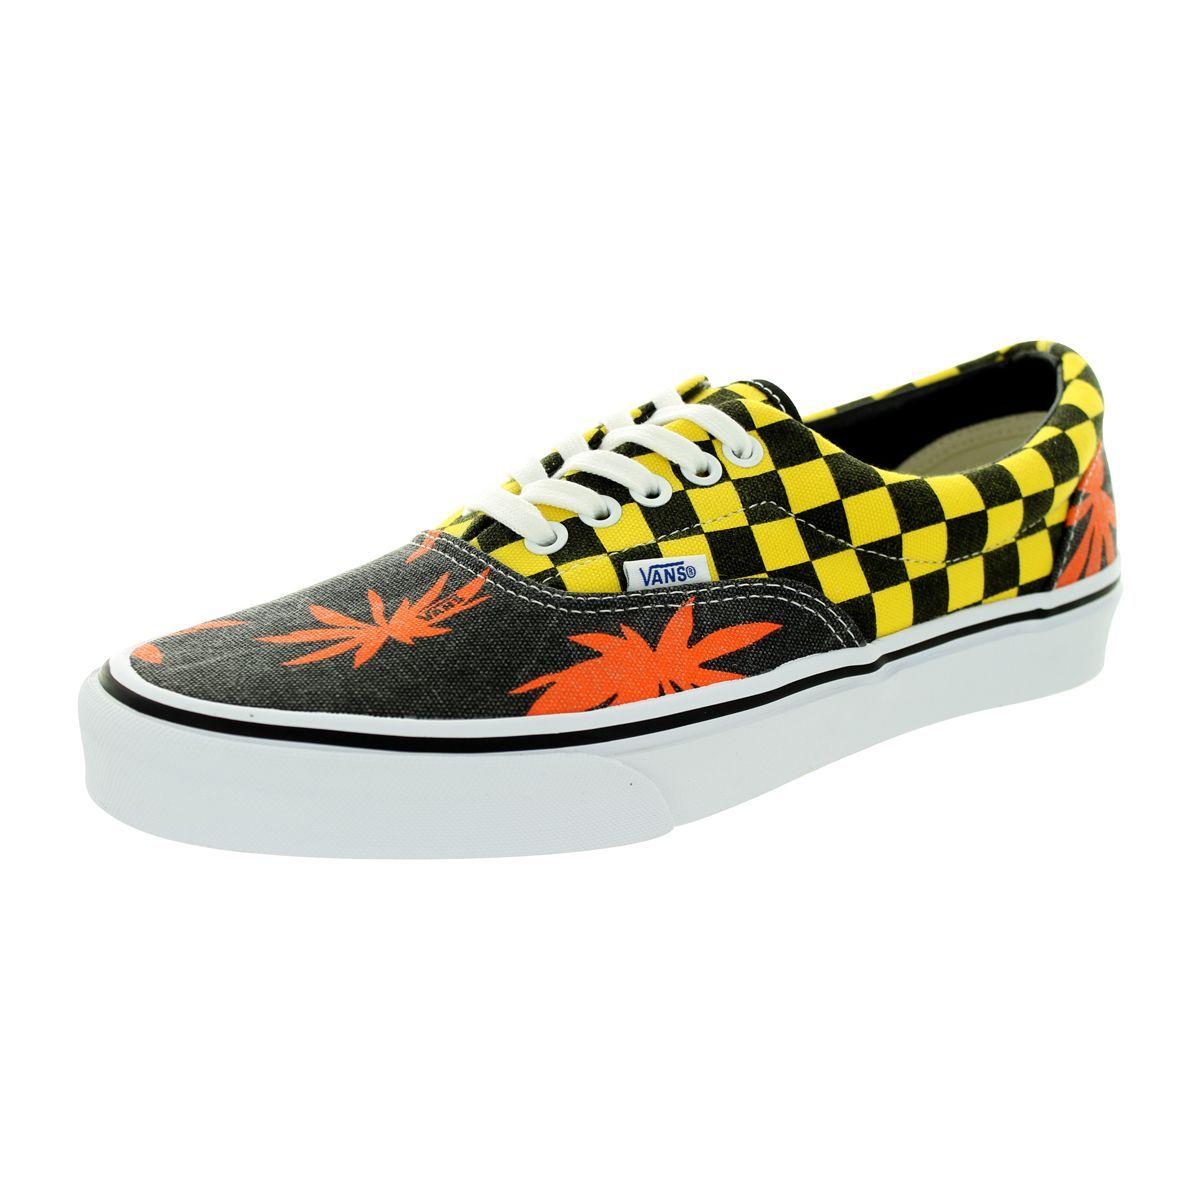 Vans Unisex Era Van Doren Orange/Yellow Skate Shoe